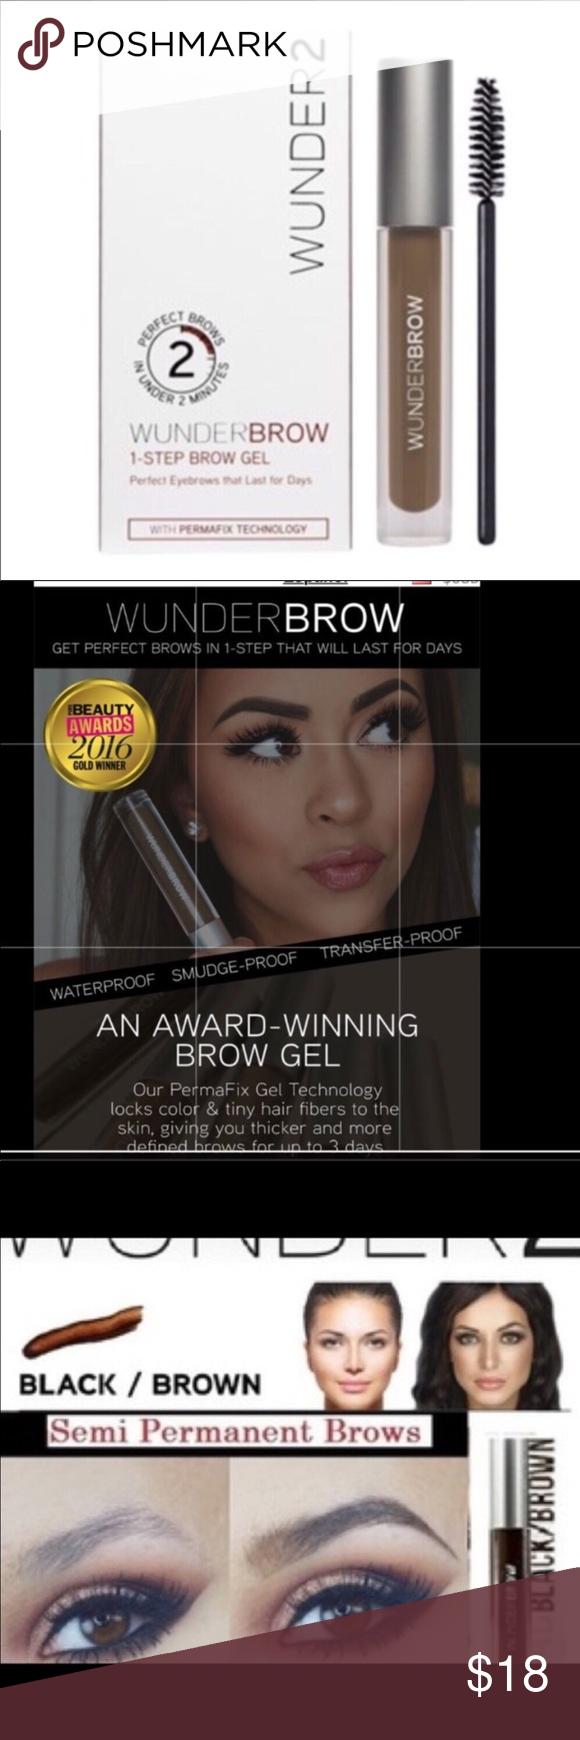 WunderBrow gel eyebrow filler